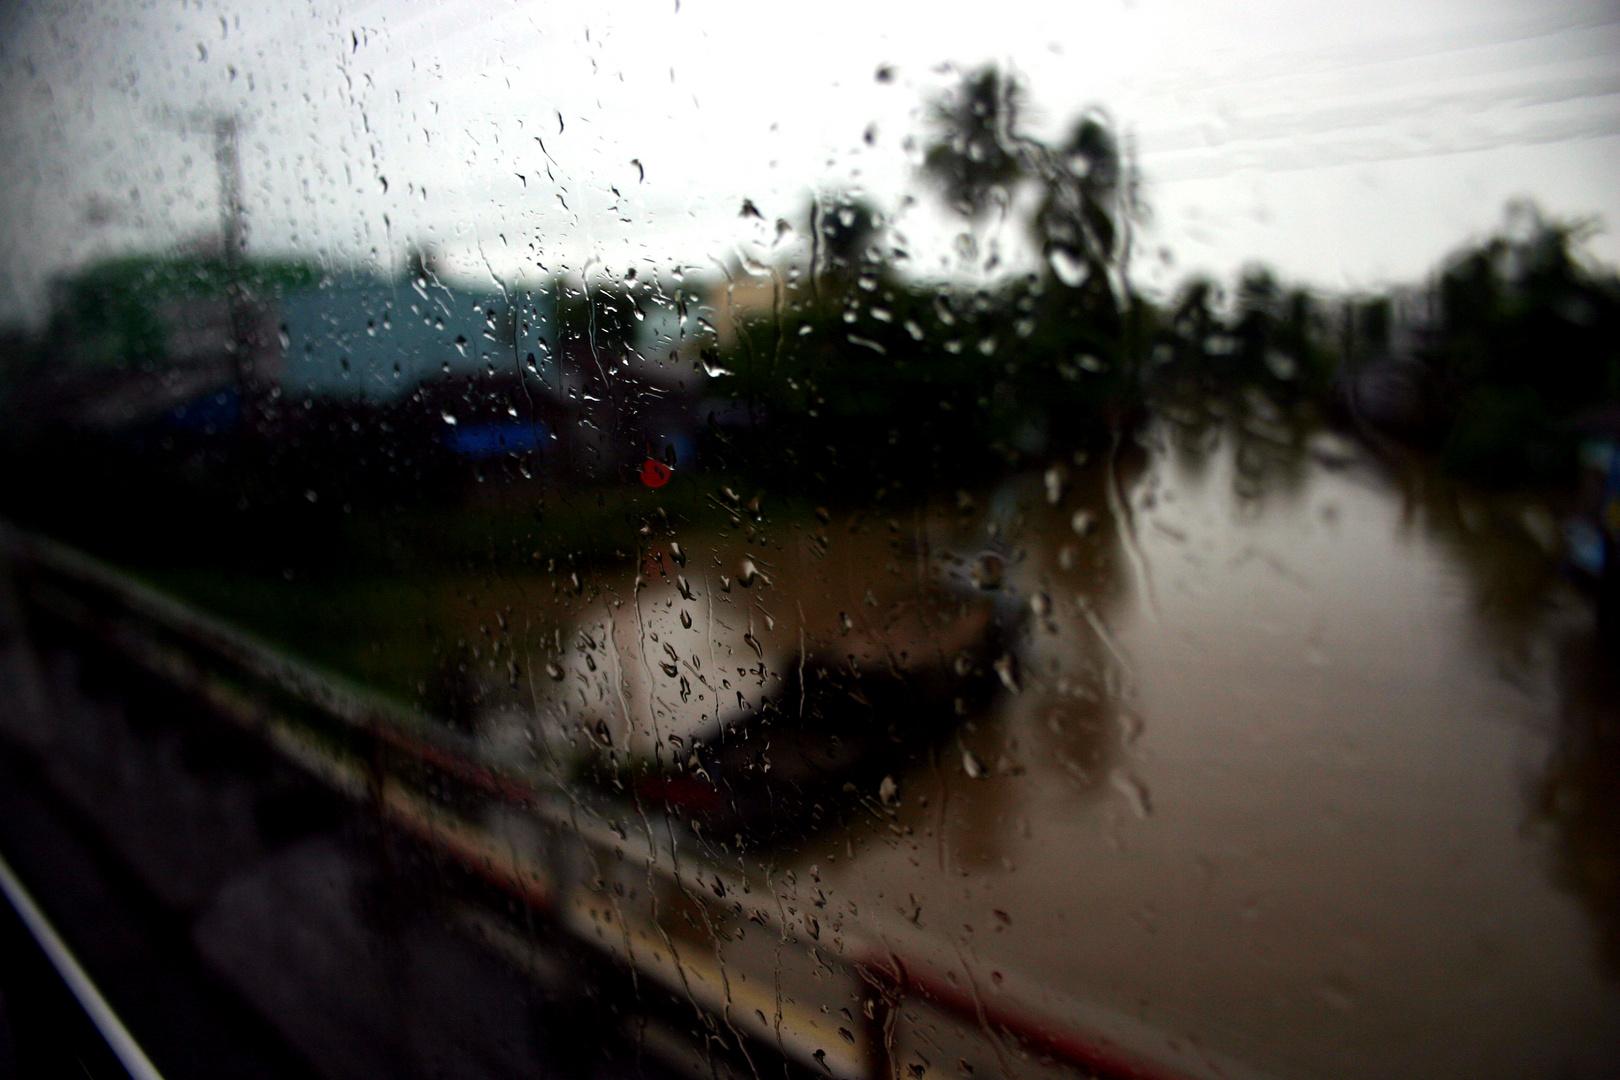 Mekong dietro la finestra